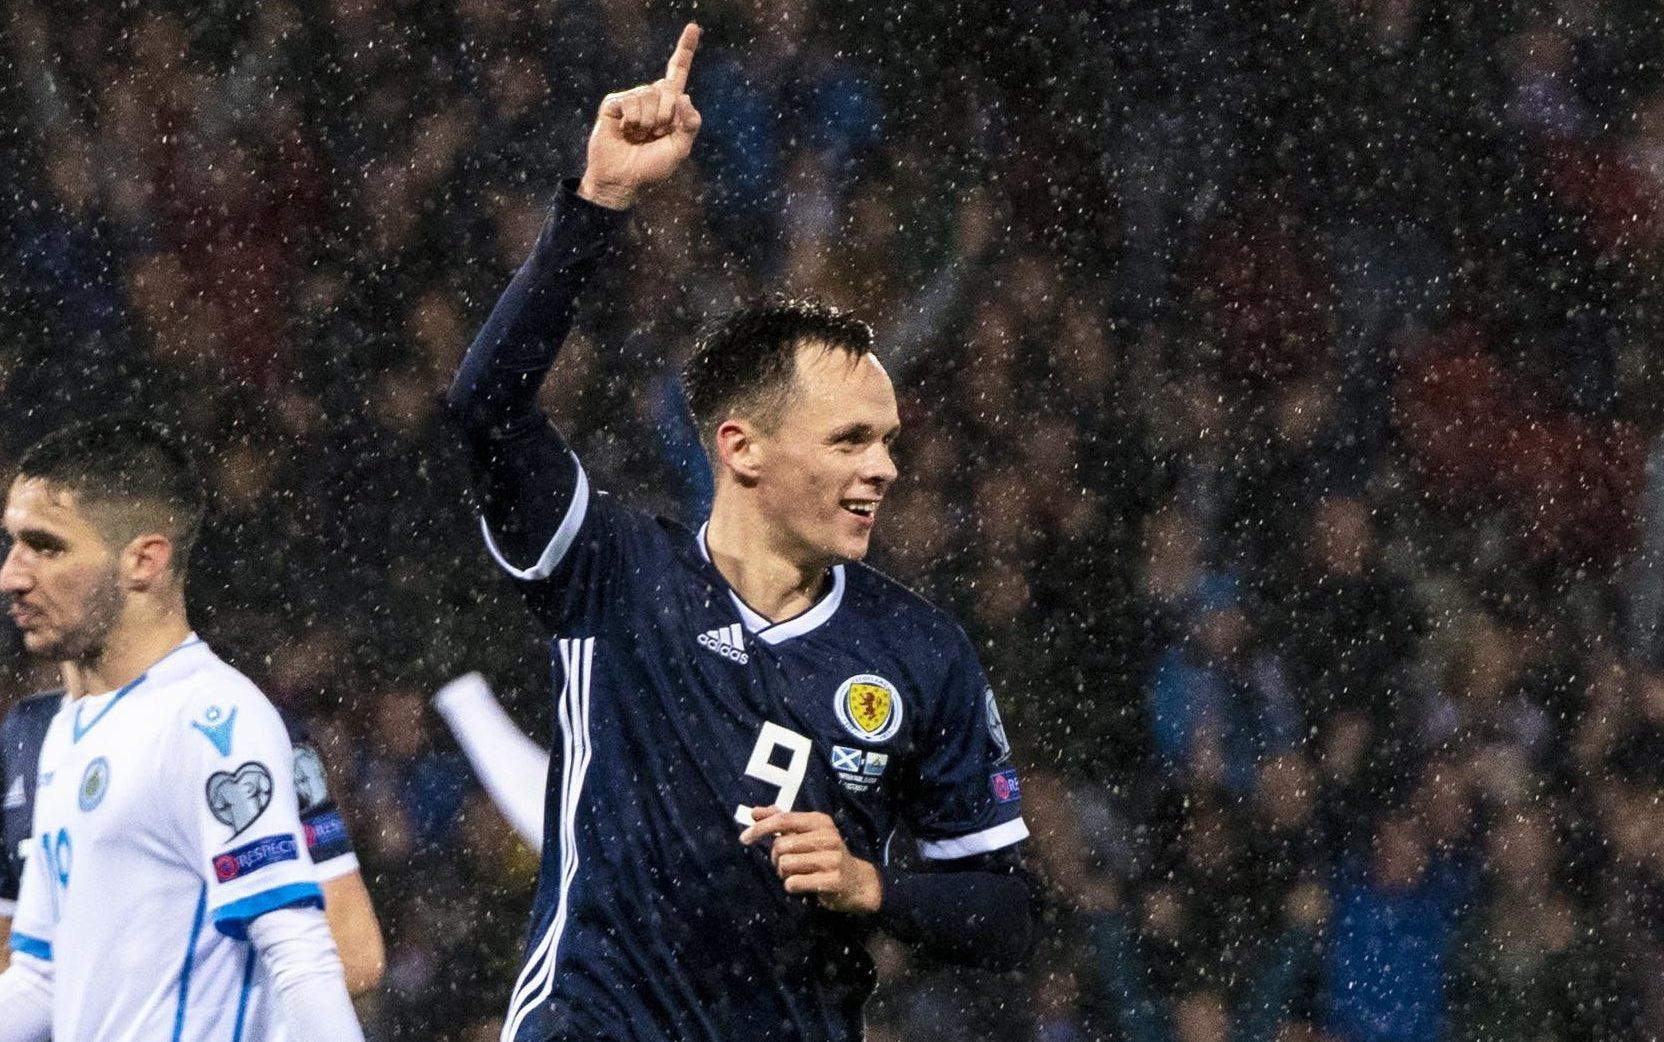 Lawrence Shankland celebrating his goal for Scotland against San Marino